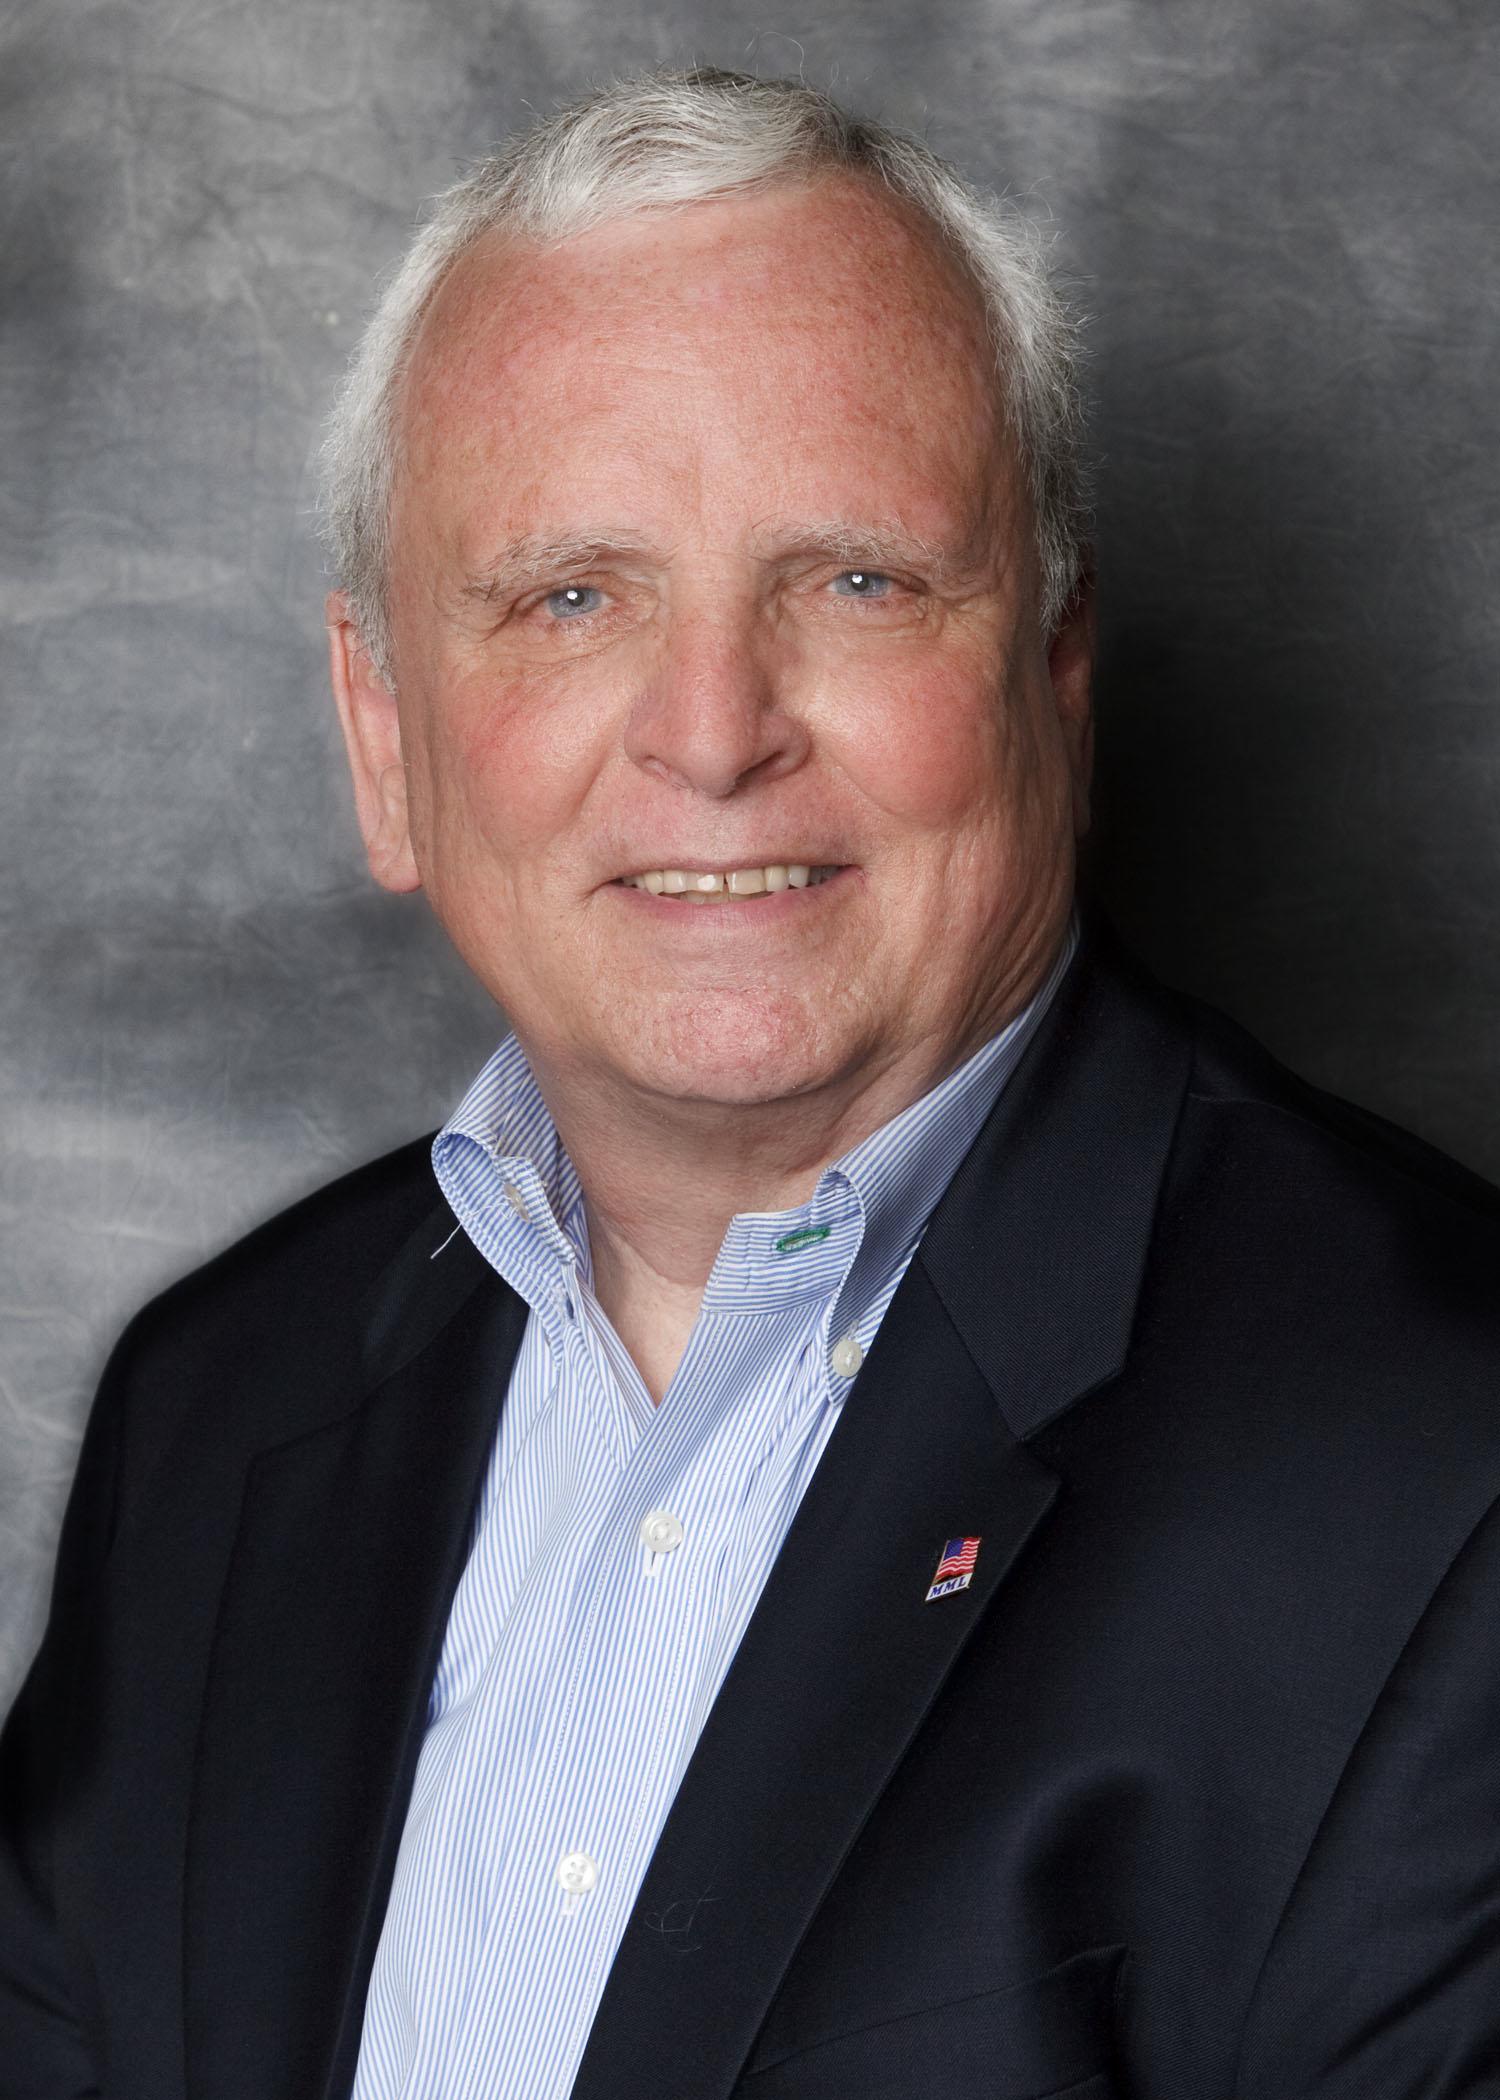 Eddie Fulton, Mayor of Quitman, Mississippi.